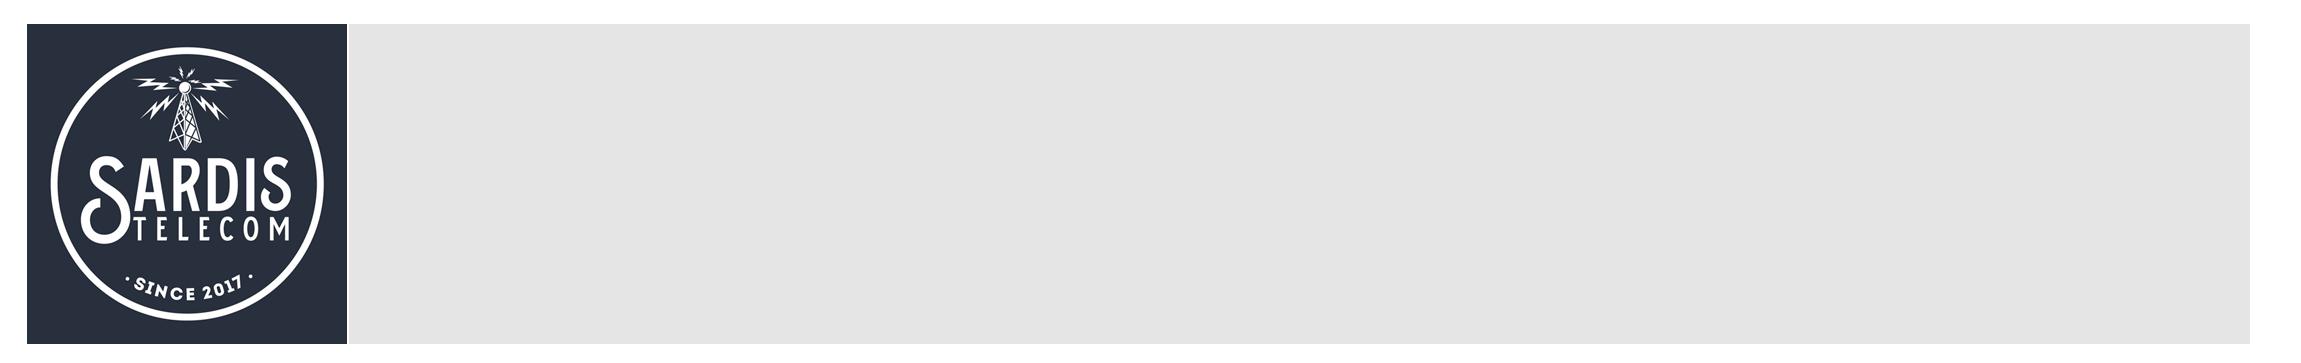 sardistel-knowledge-base-logo